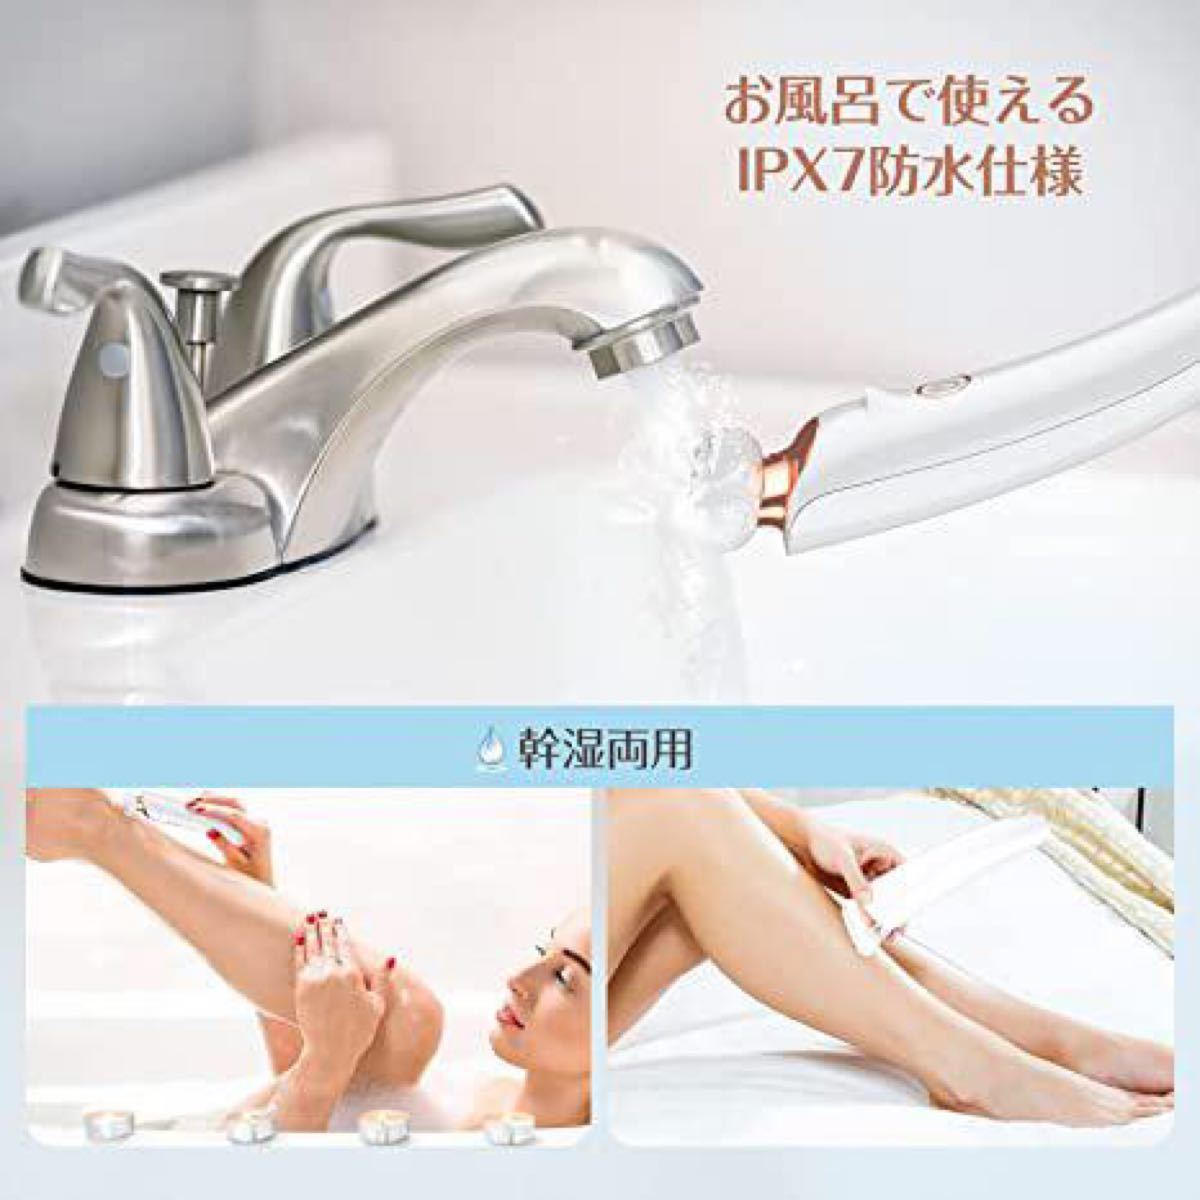 3In1多機能レディースシェーバー ムダ毛処理全身シェーバー 電動VIOシェーバー 洗顔角質ケアブラシ 防水 USB充電式